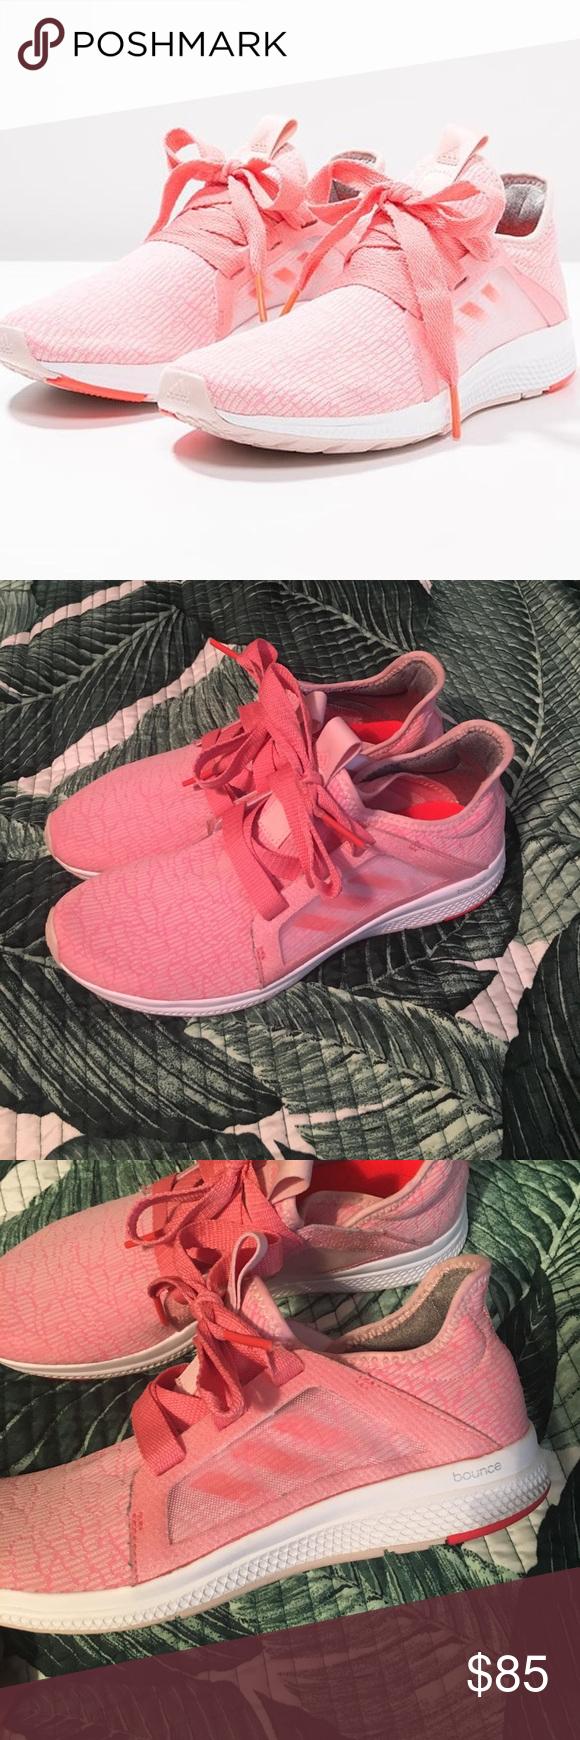 Adidas edge lux pinterest rosa corallo, casual e adidas